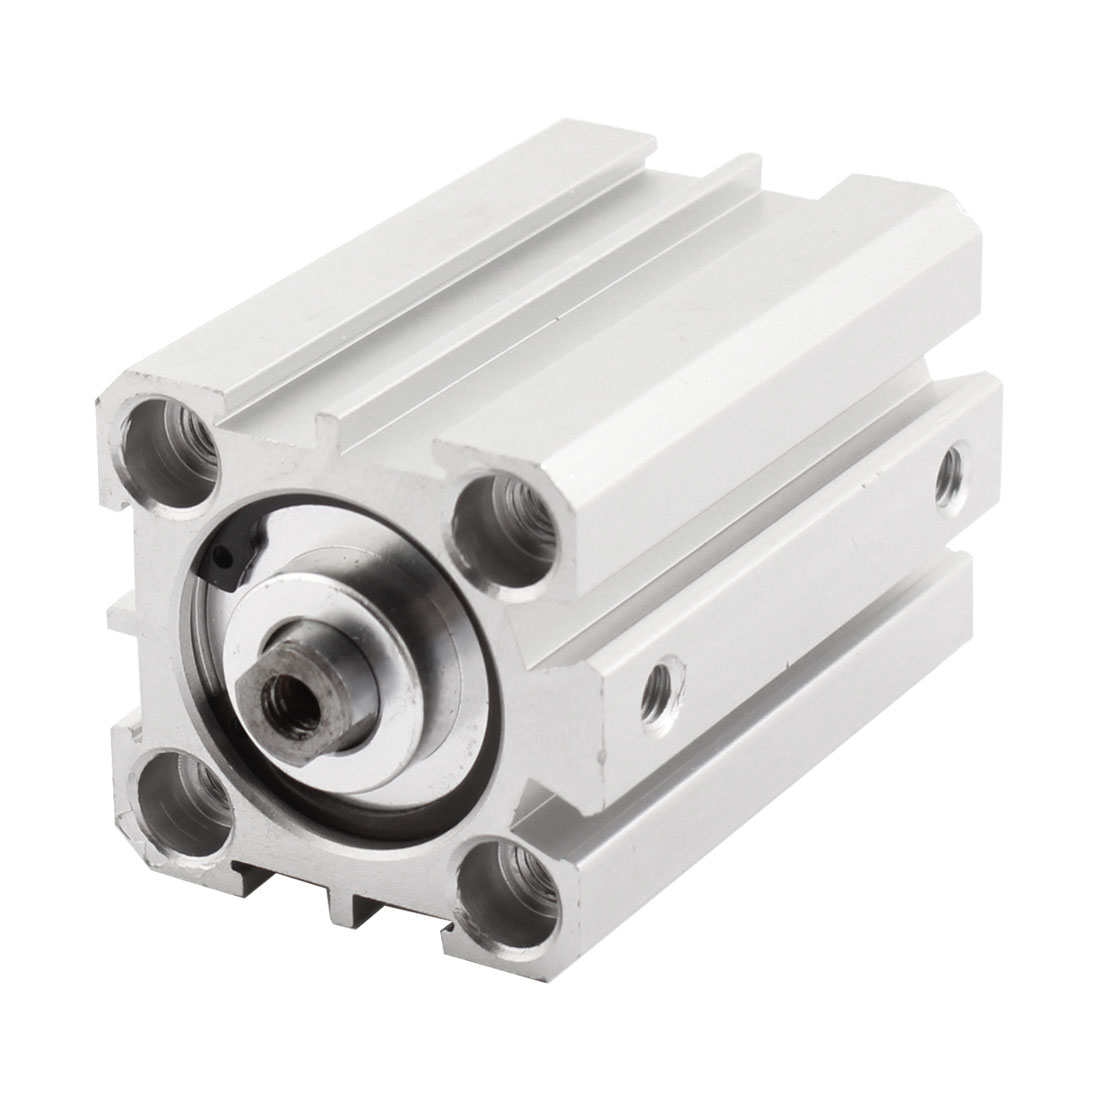 25mm Bore 40mm Stroke Aluminum Alloy Compact Mini Thin Air Cylinder Pneumatic Repair Parts Silver Tone